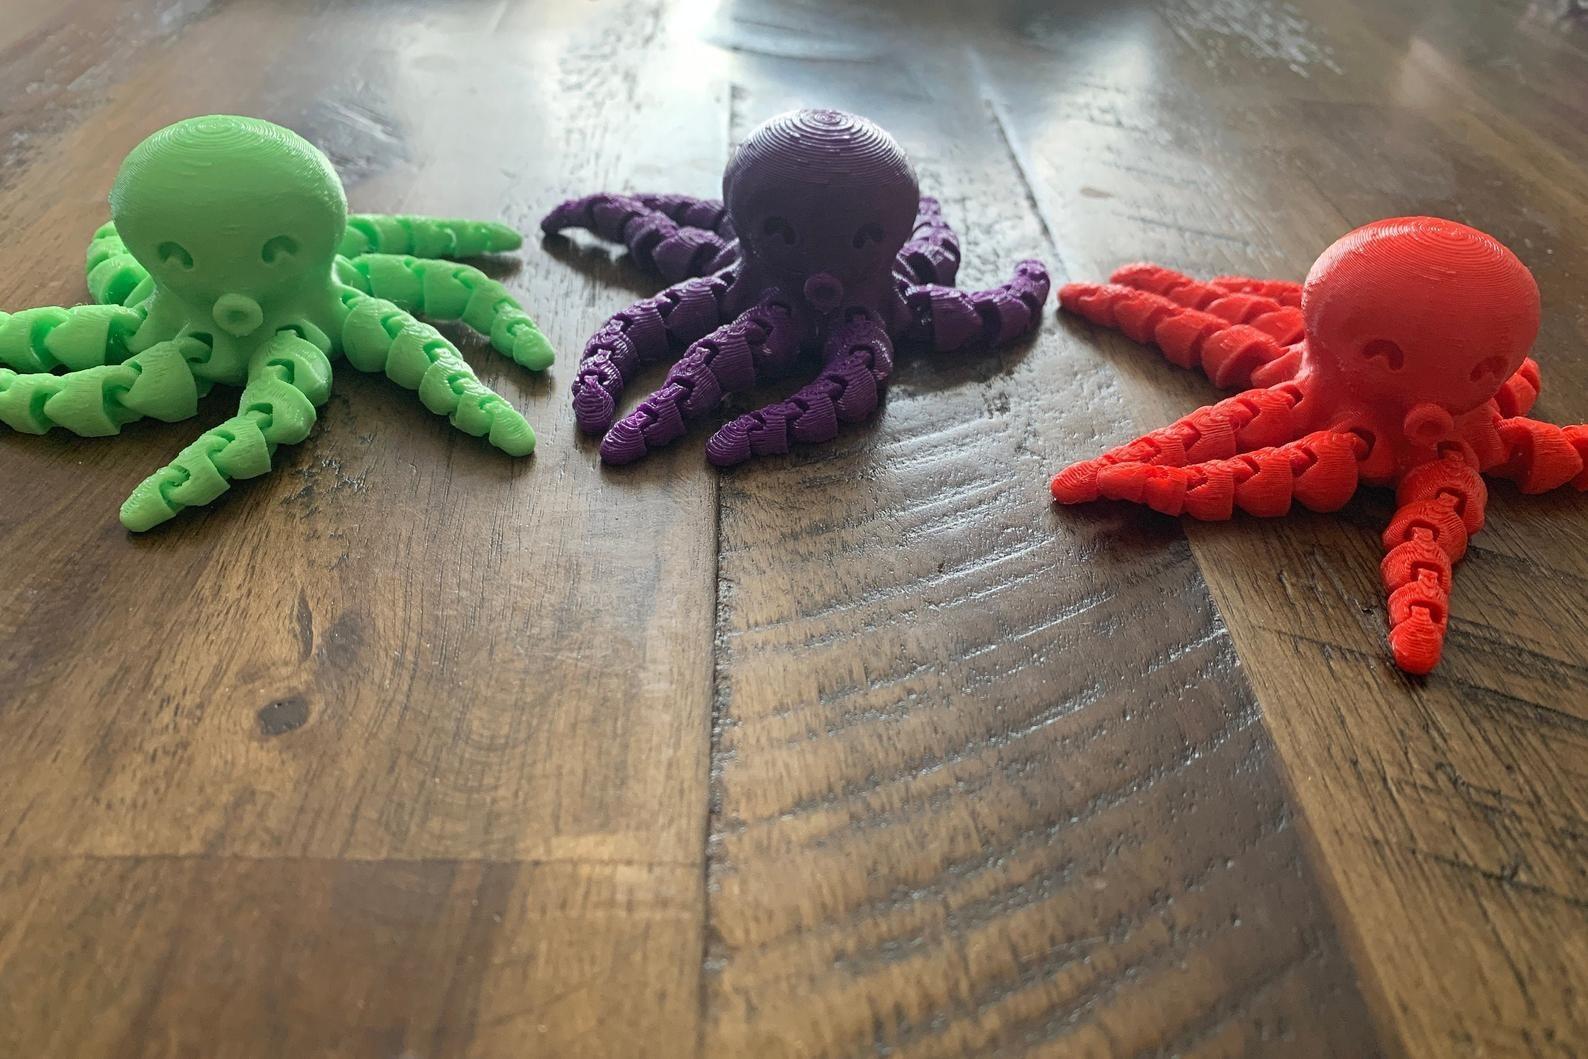 three flexible octopus fidget toys on a wooden surface